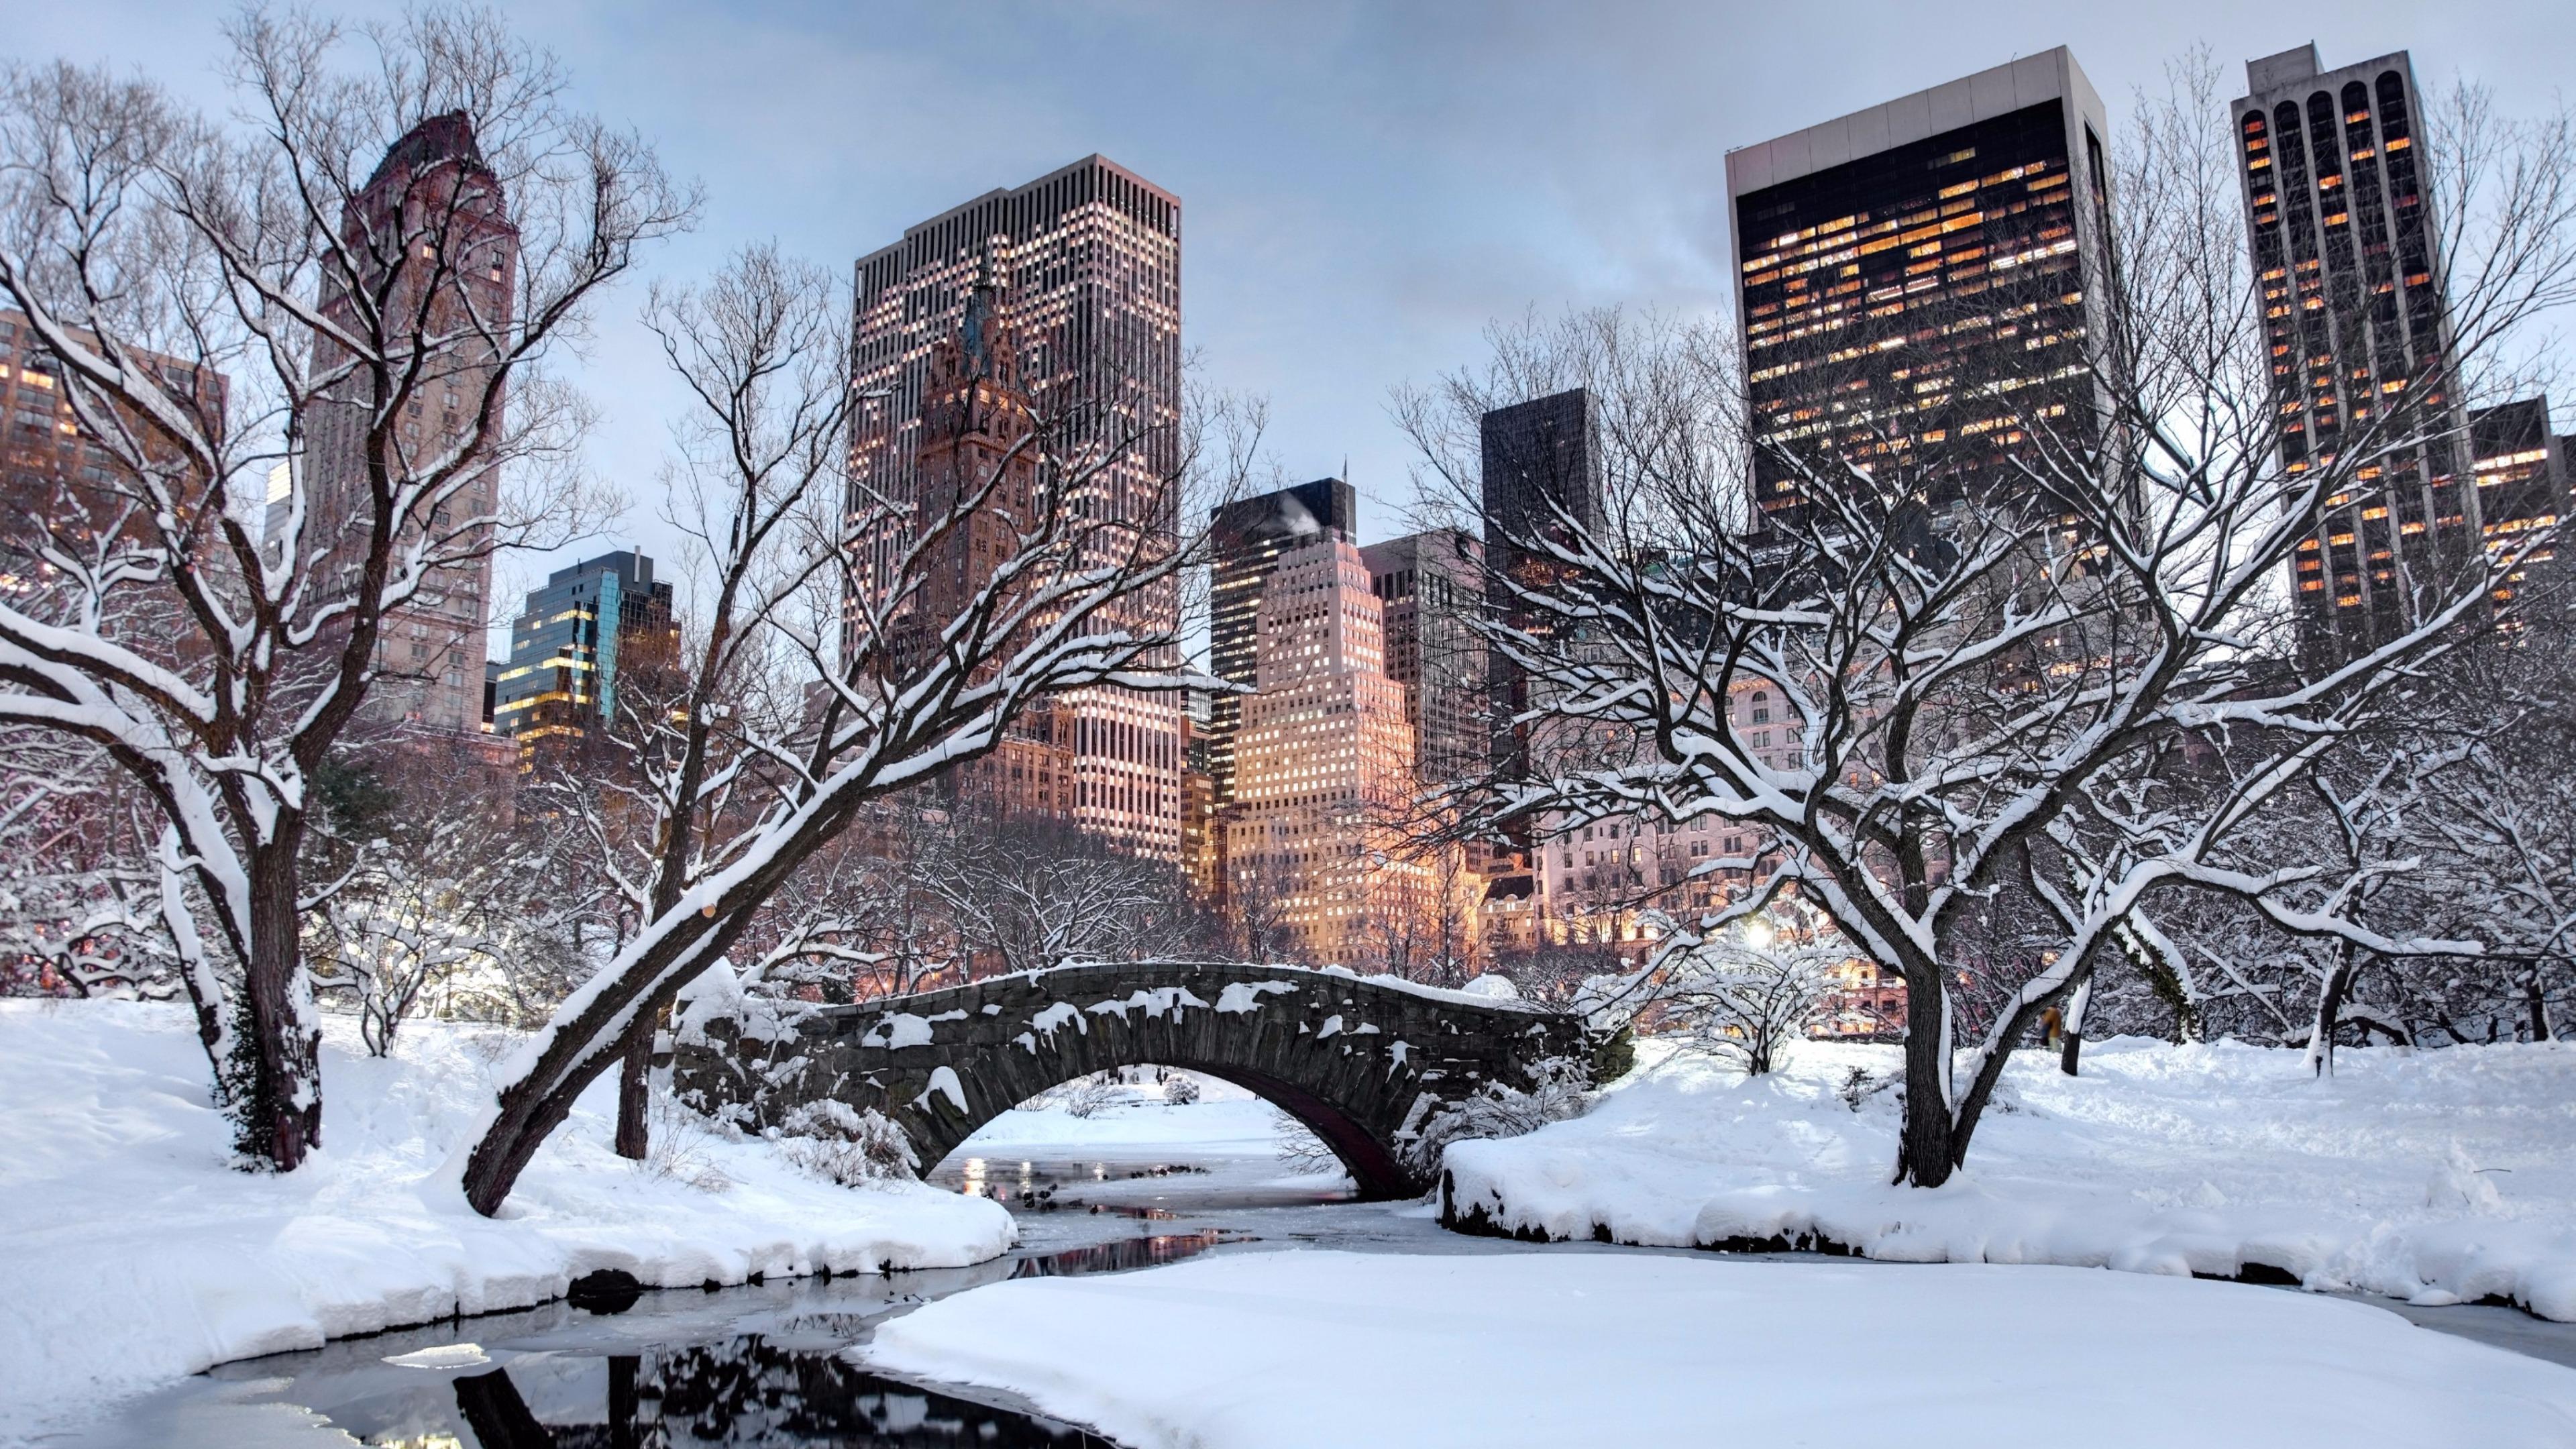 New York Winter Wallpapers   Top New York Winter Backgrounds 3840x2160